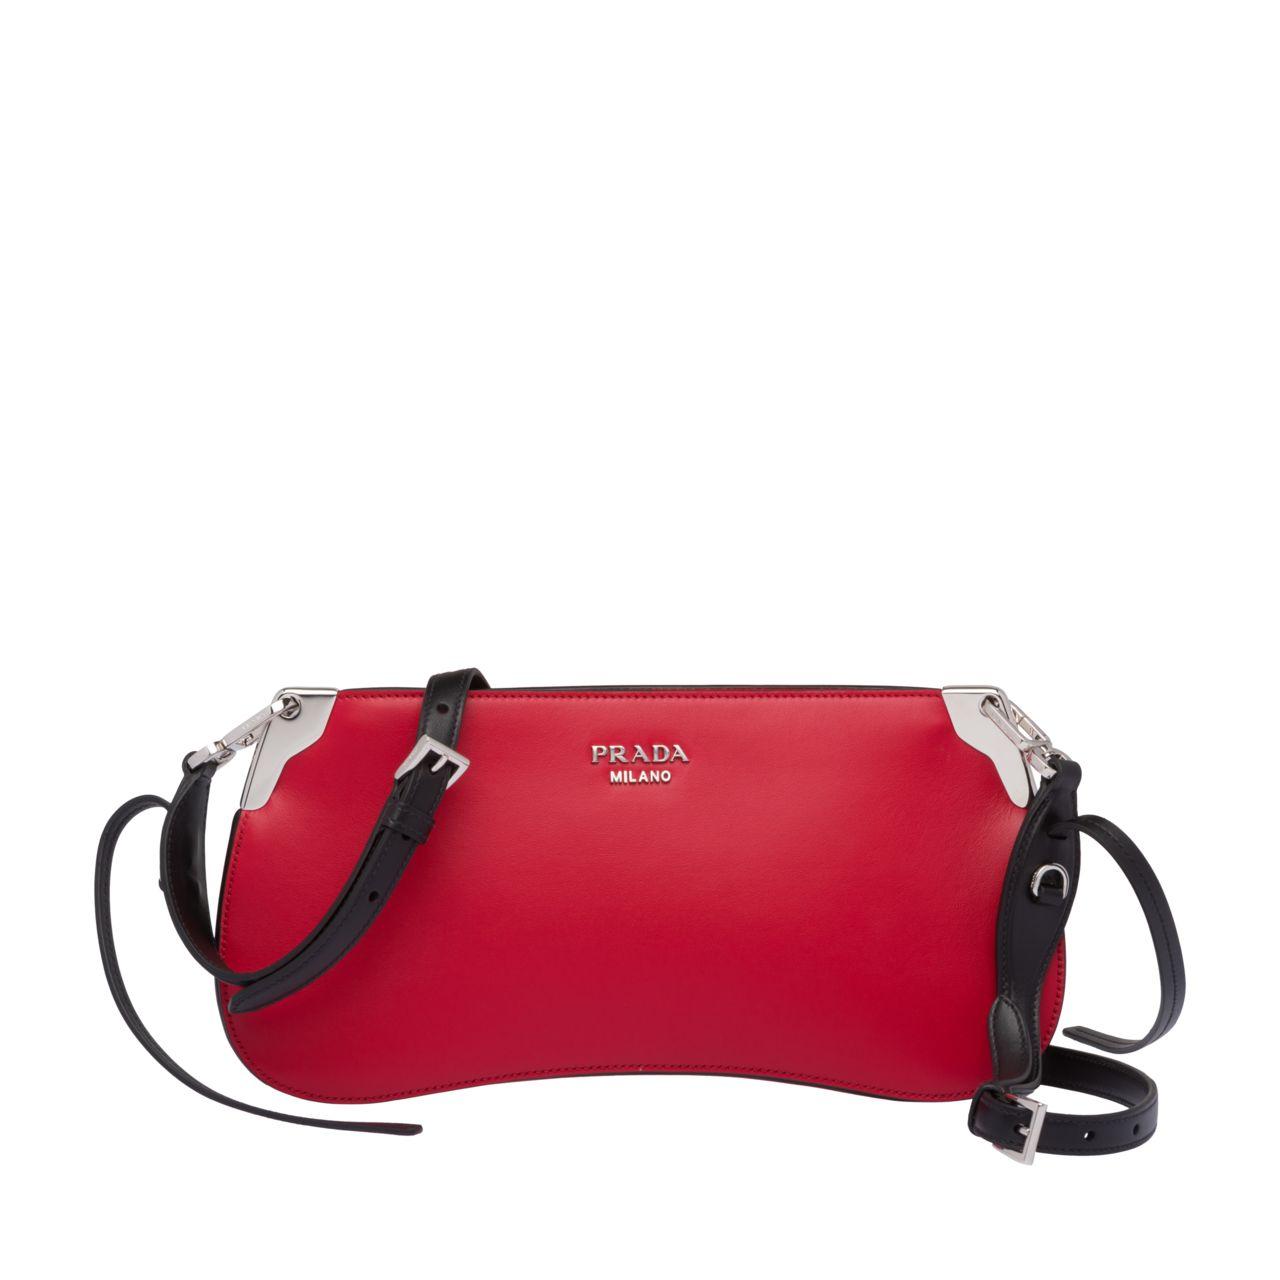 27baec92f930 Prada Spring Summer 2019 Bag Collection